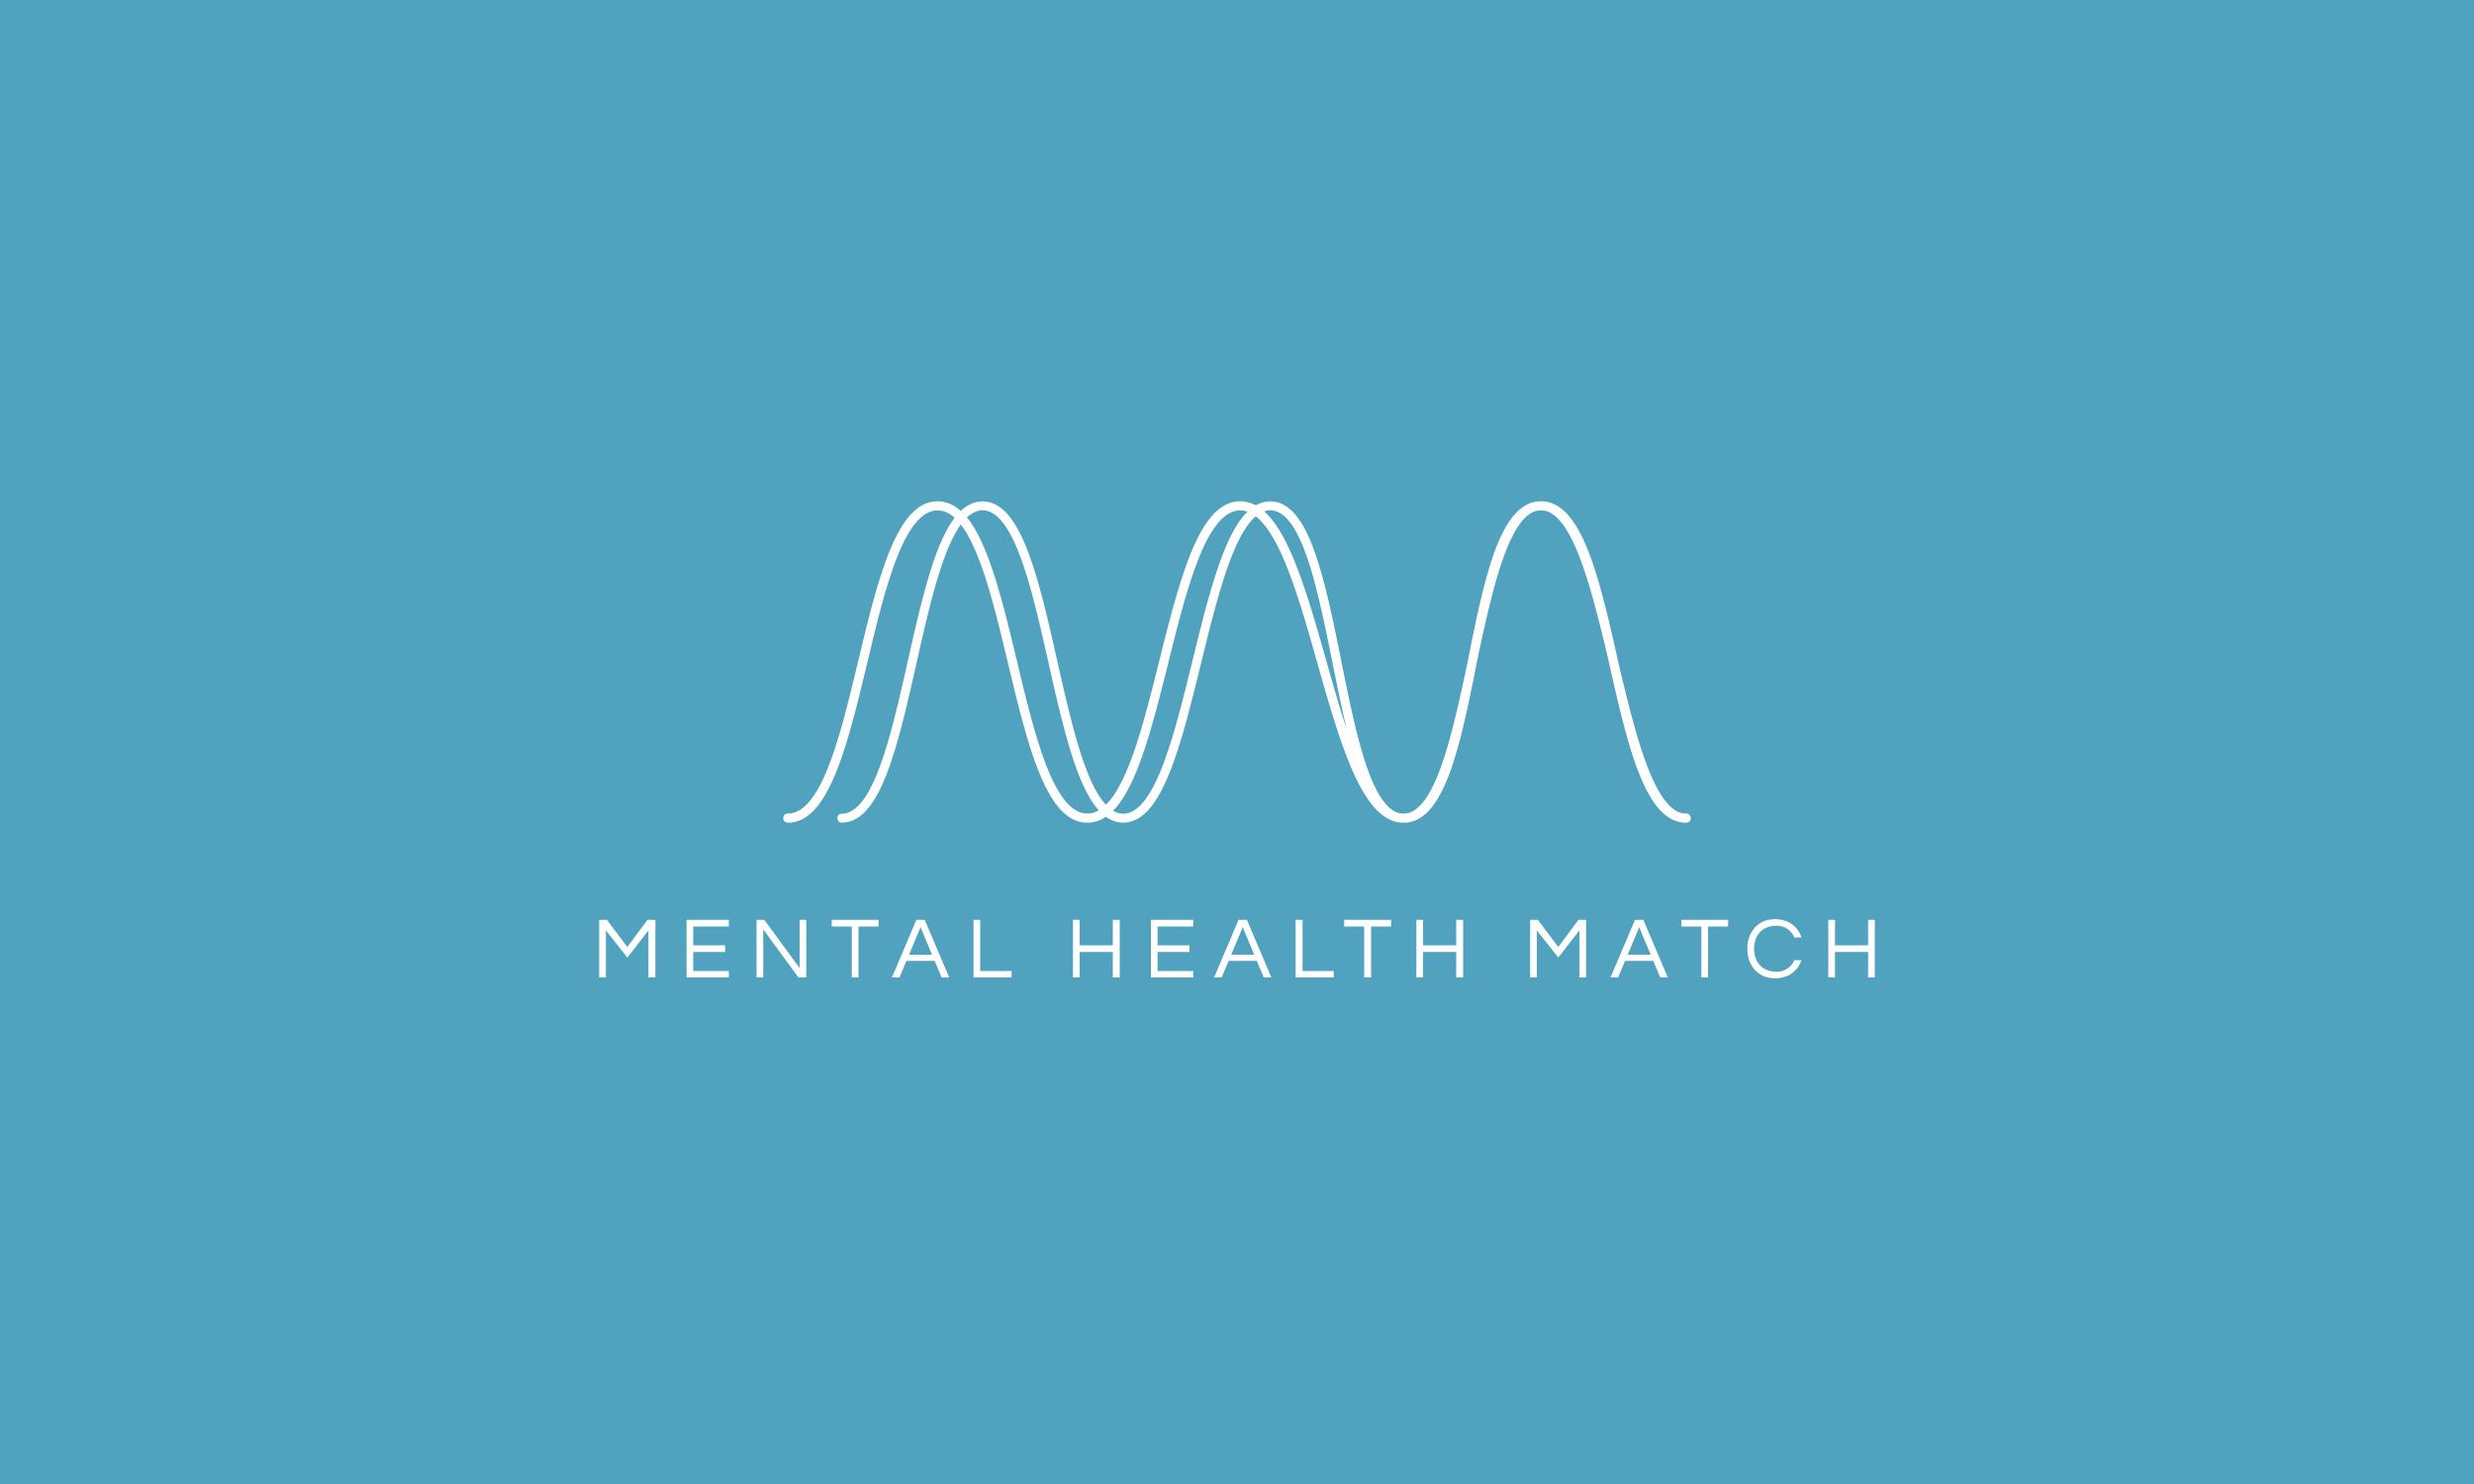 Mental_Health_Match_Logo_White_on_Blue_Square.jpg